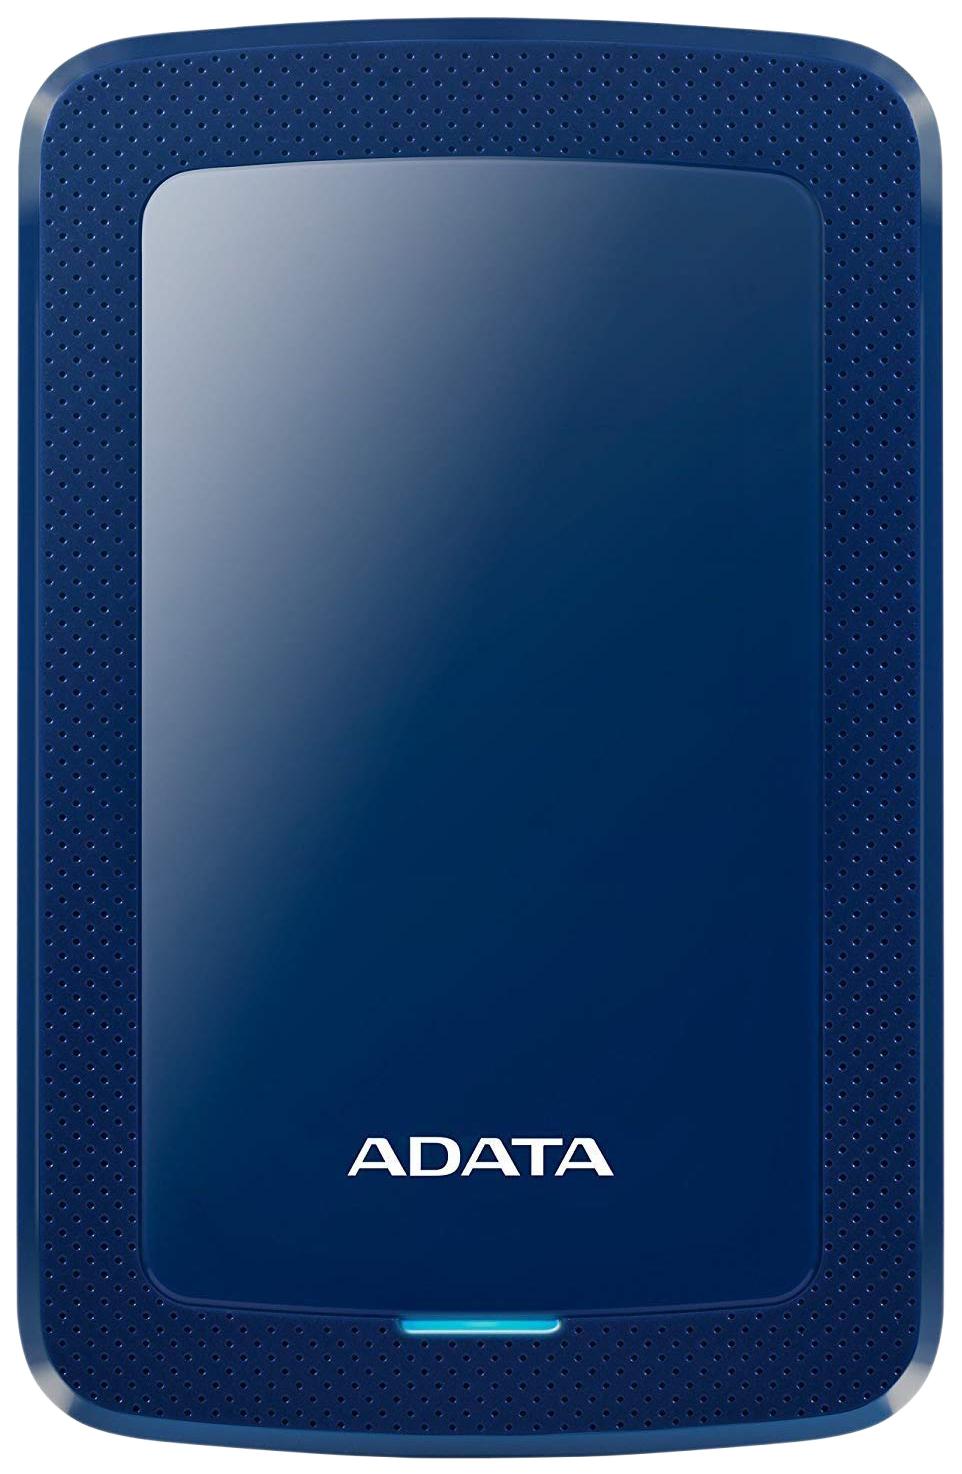 Внешний диск HDD ADATA 2TB Blue (AHV300